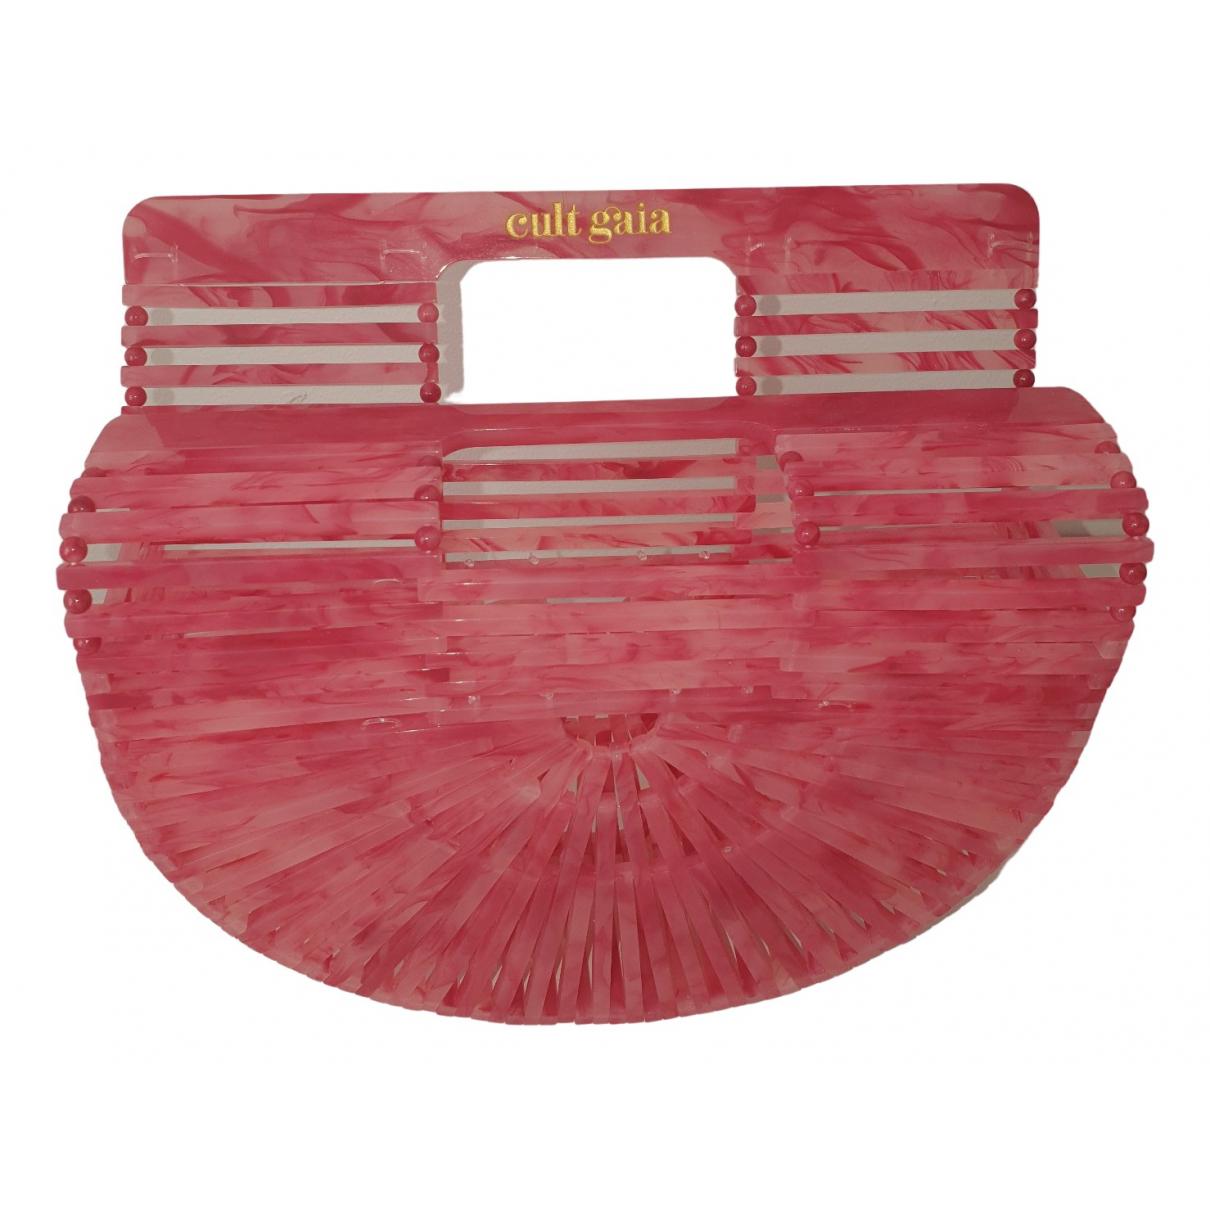 Cult Gaia Acrylic Ark Clutch in  Rosa Kunststoff